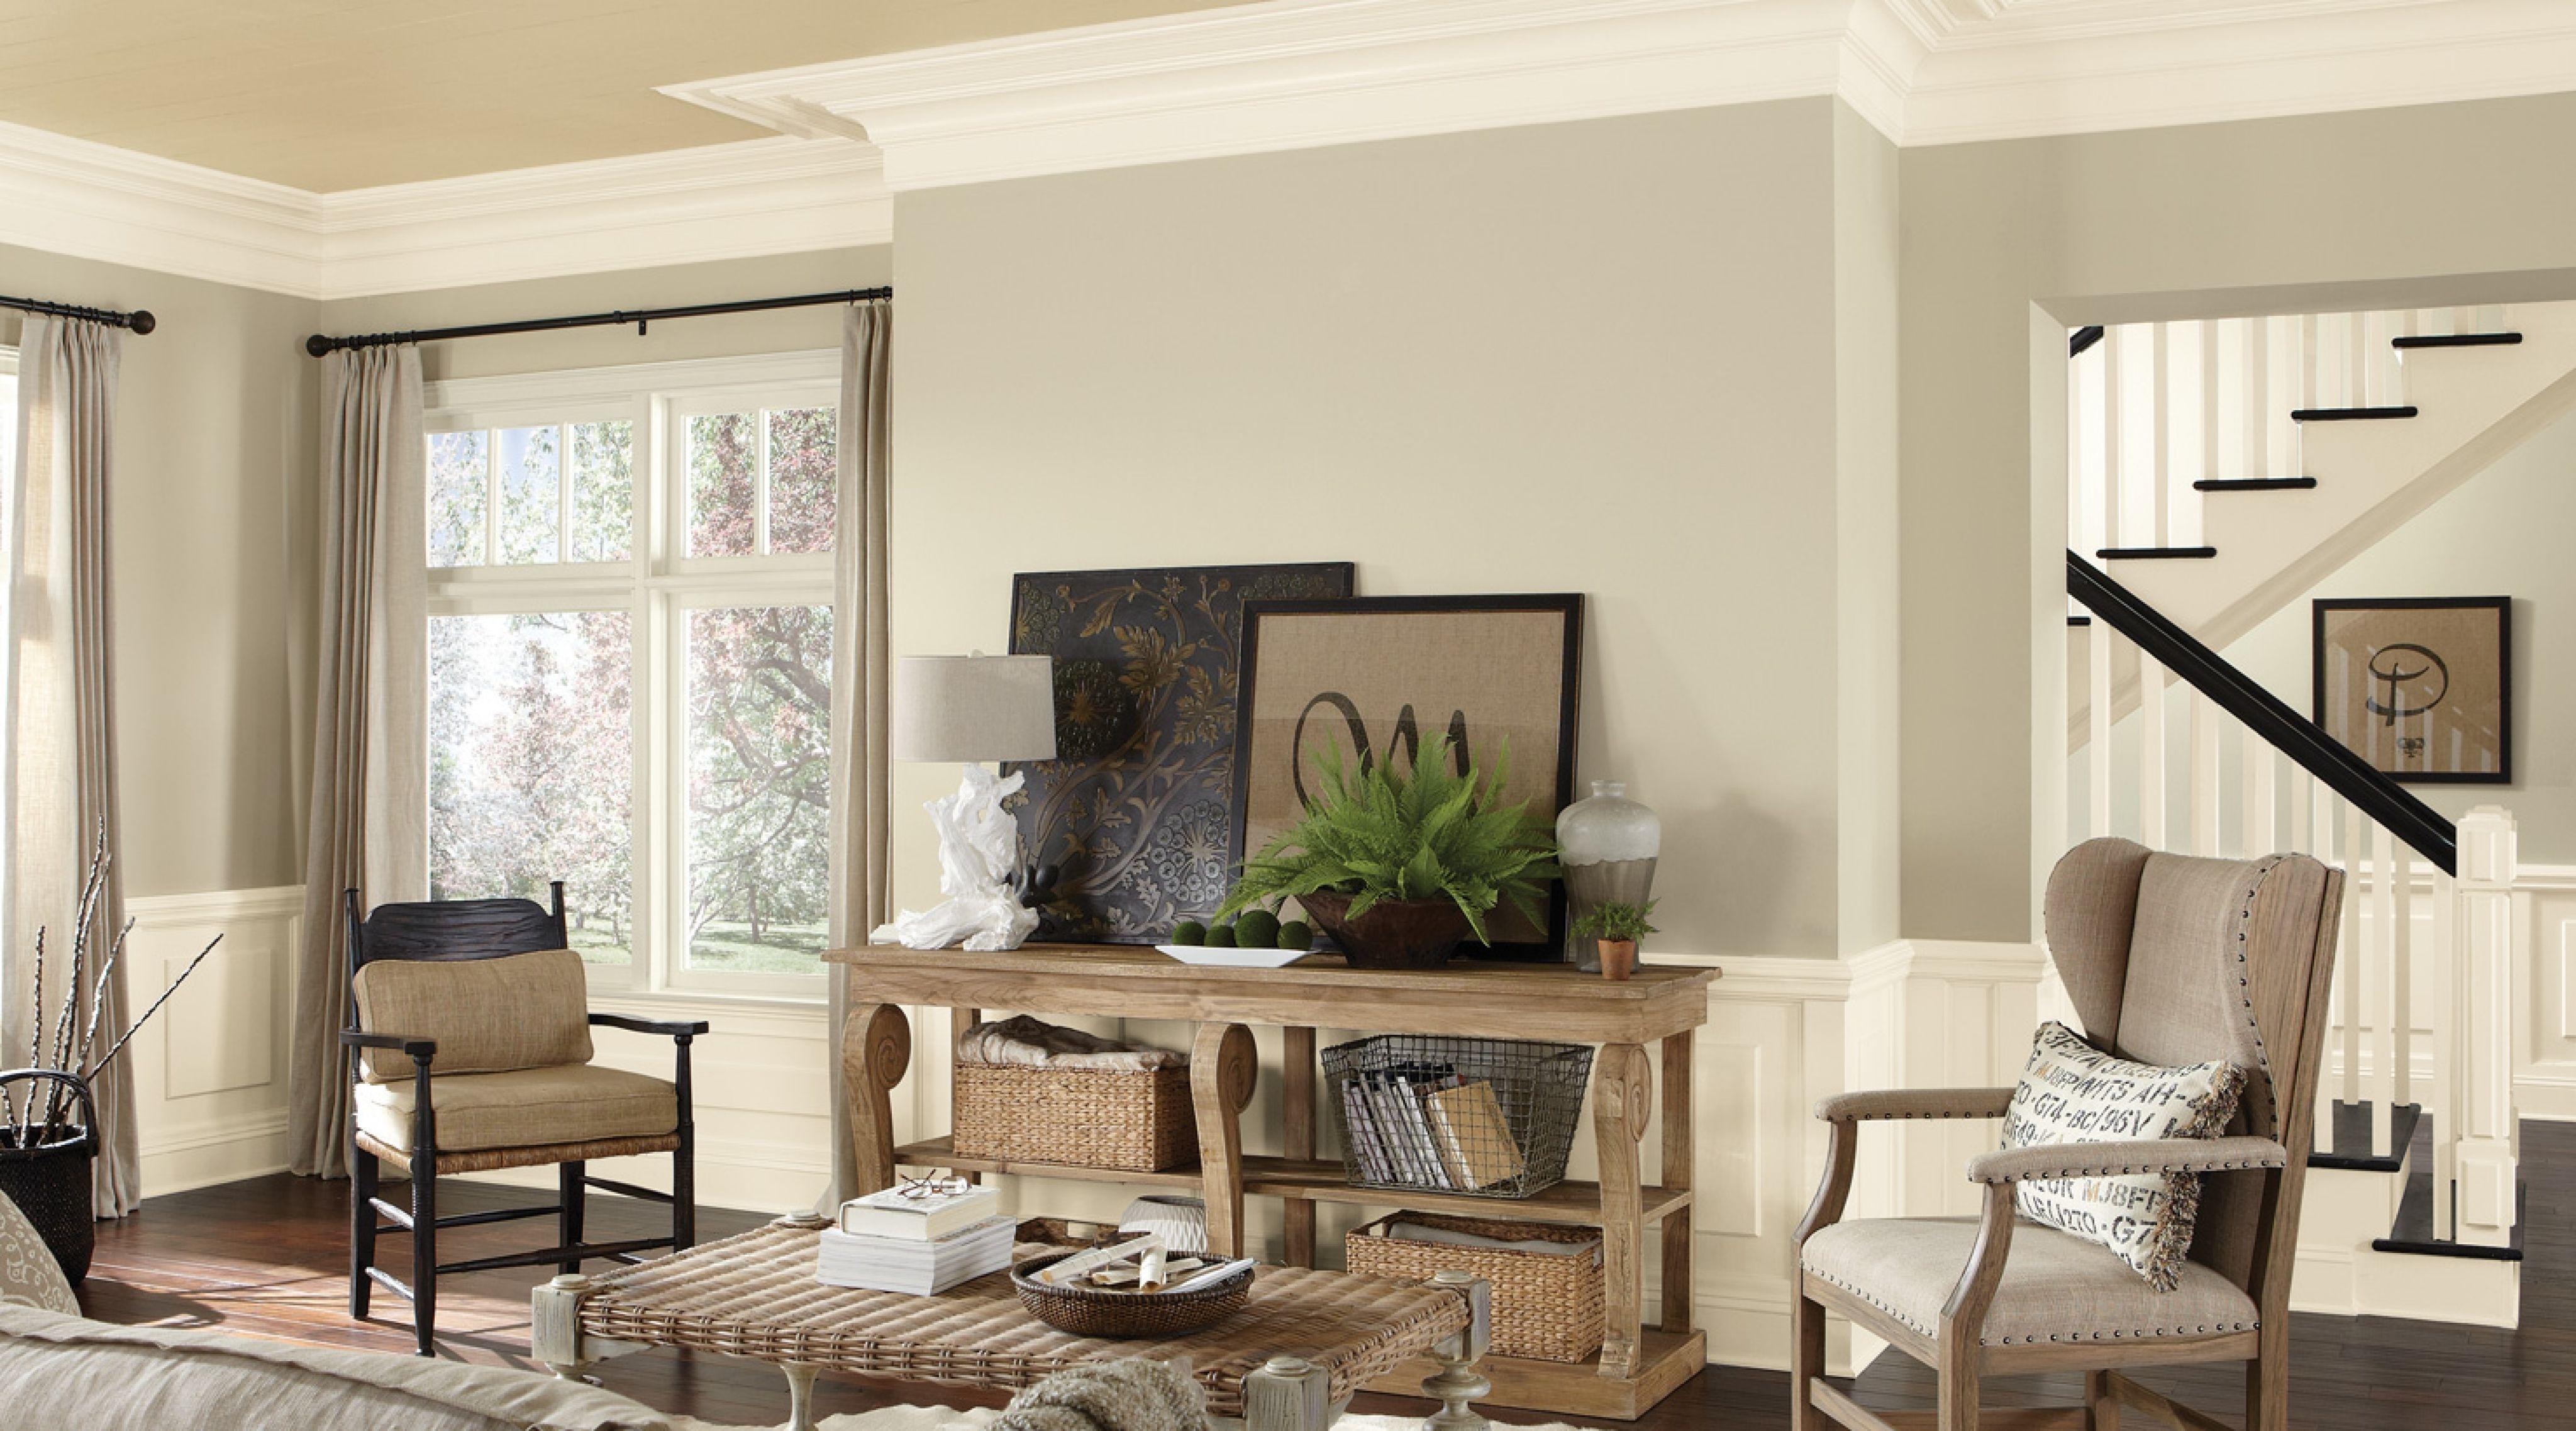 Paint Color Ideas For Living Room - neutral interior paint colors ...